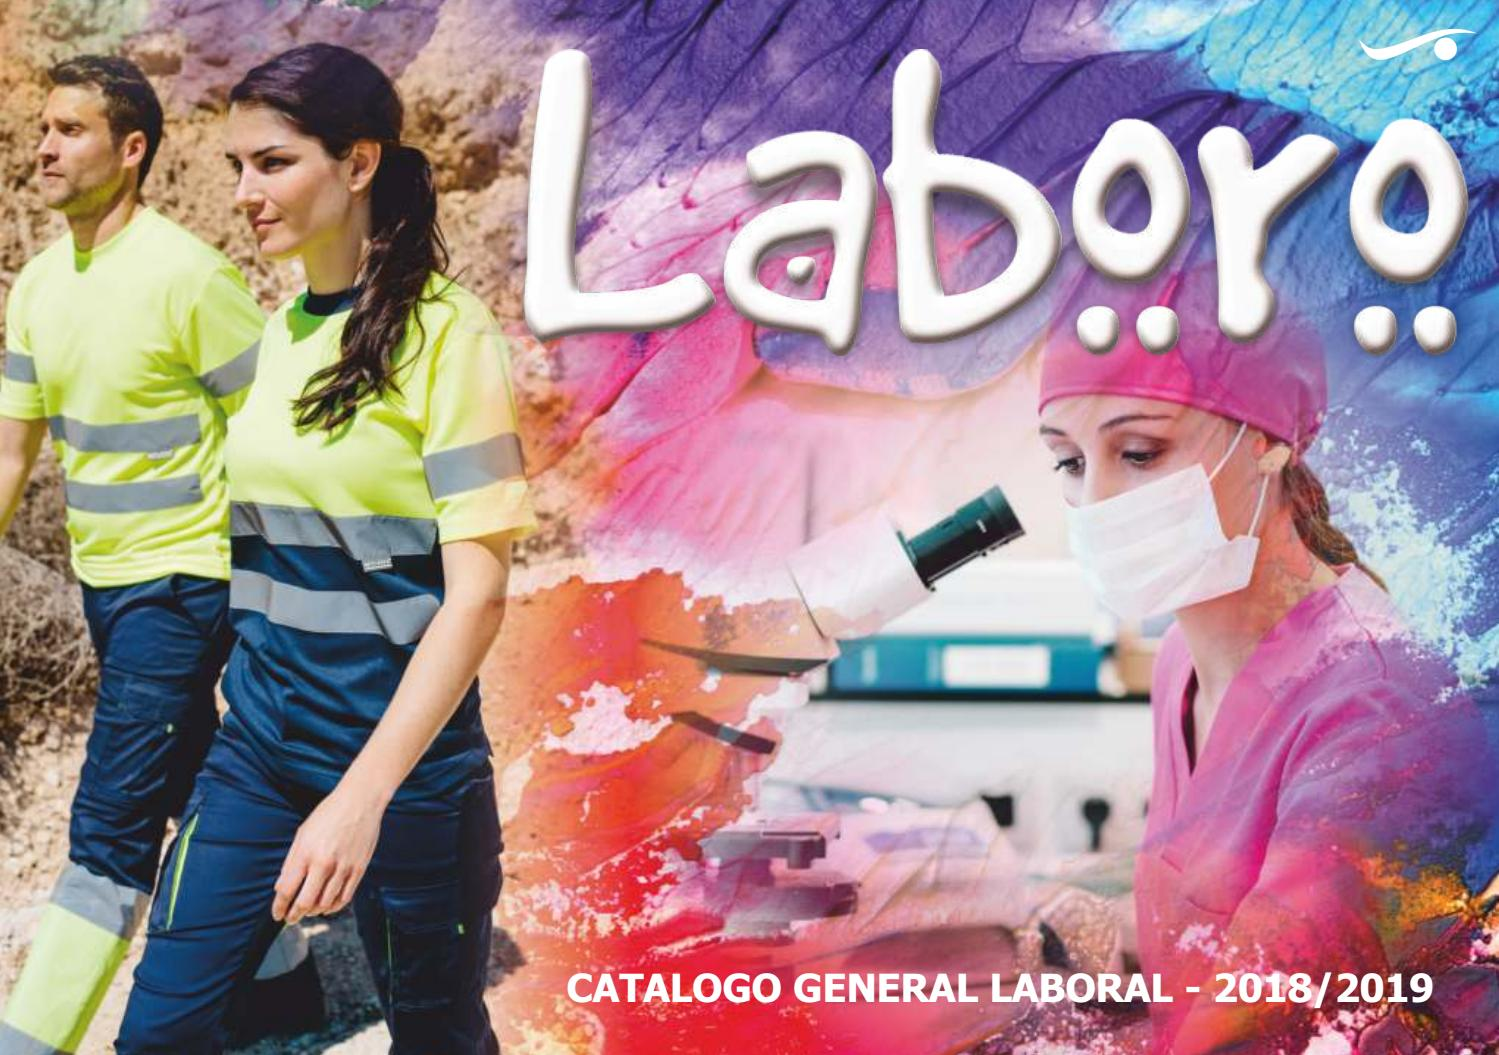 e893417eb Laboro - Ropa Laboral by rotulogic - issuu